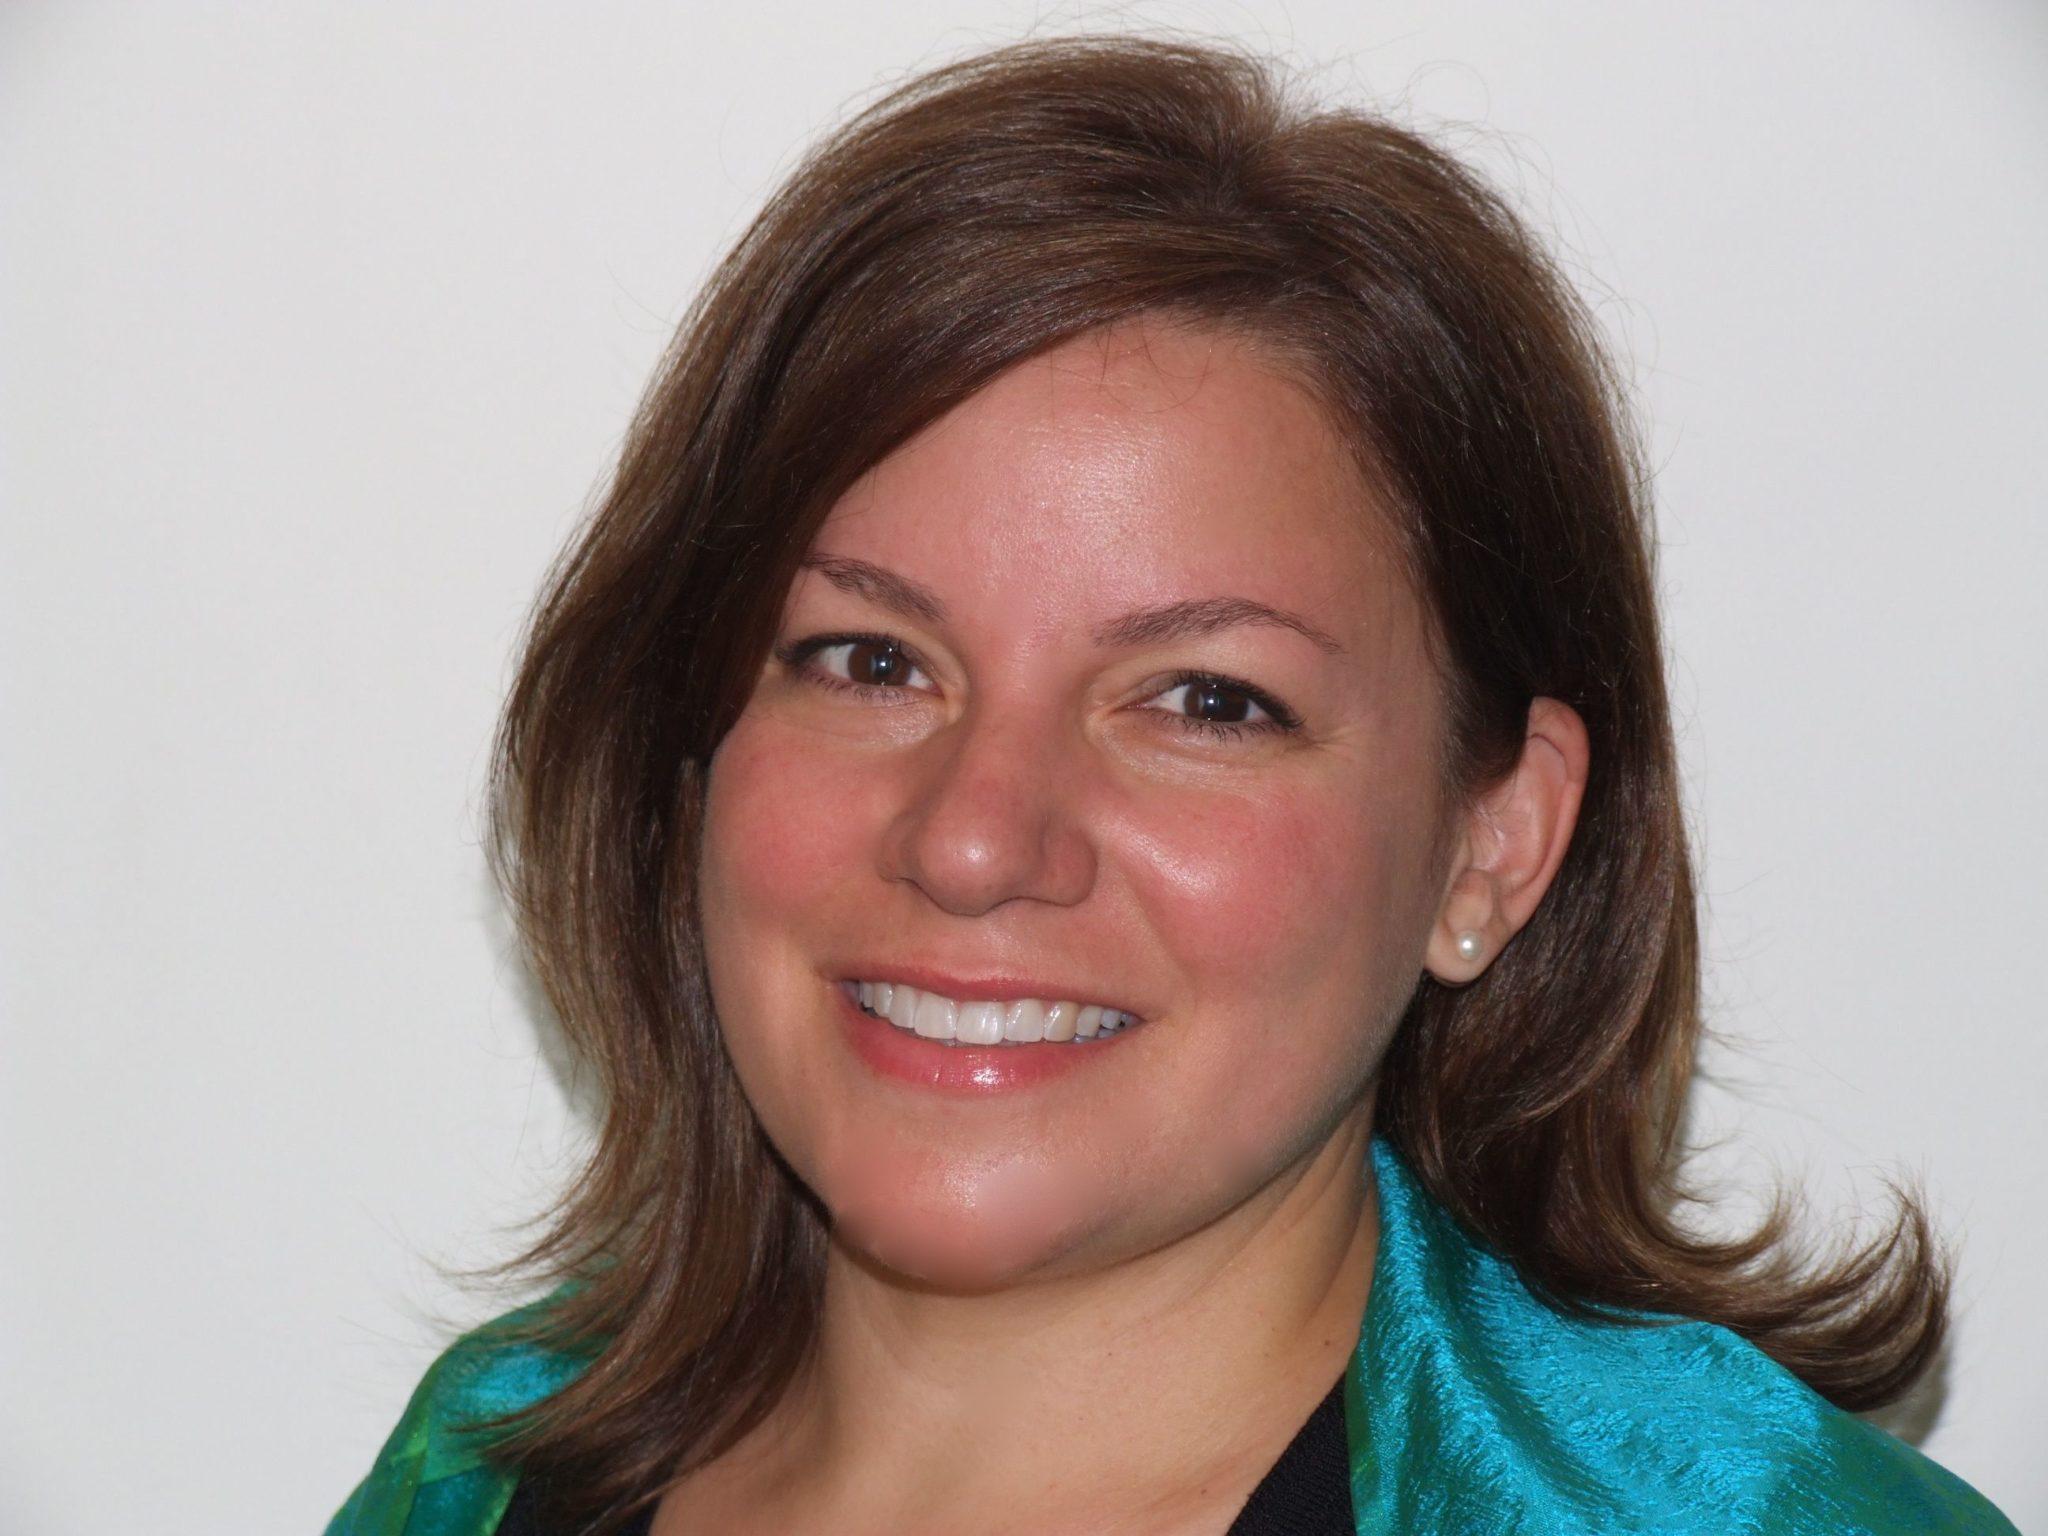 Missy Gluckmann, Melibee Global/MelibeeU